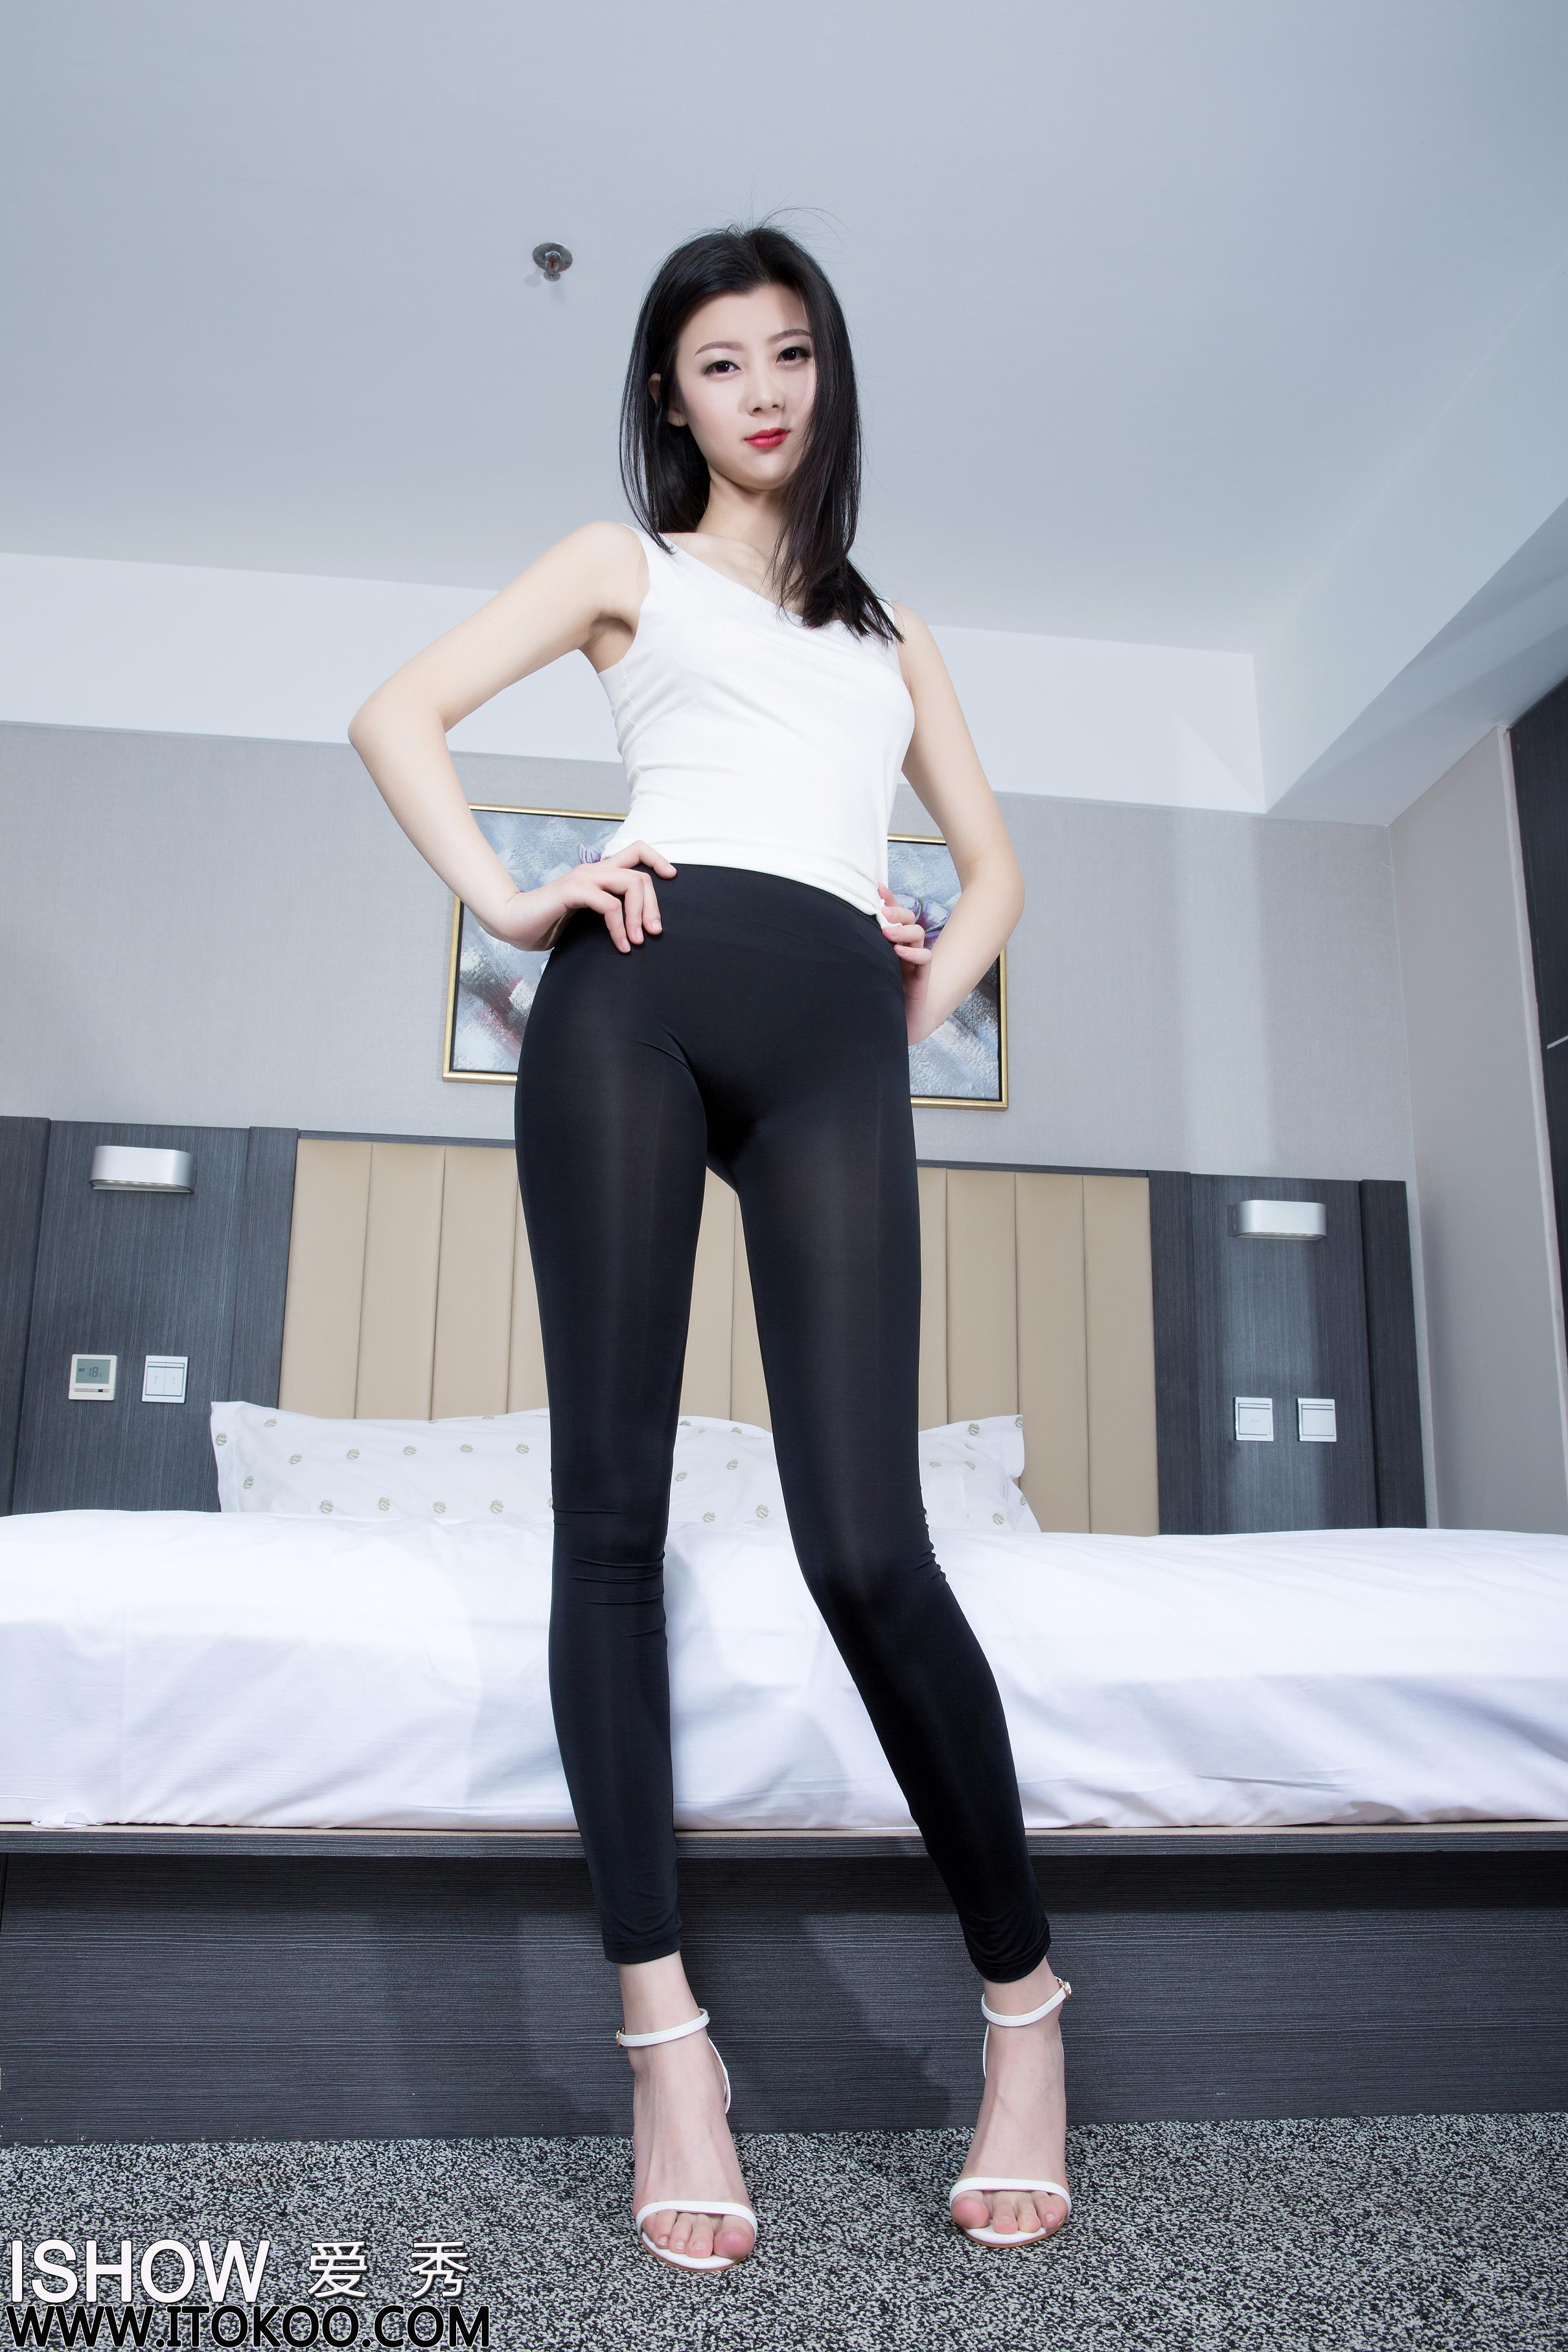 [ISHOW爱秀]白色背心加黑色紧身长裤美女 阿曼Amanda 高跟美腿性感写真 2016-05-17 NO.049